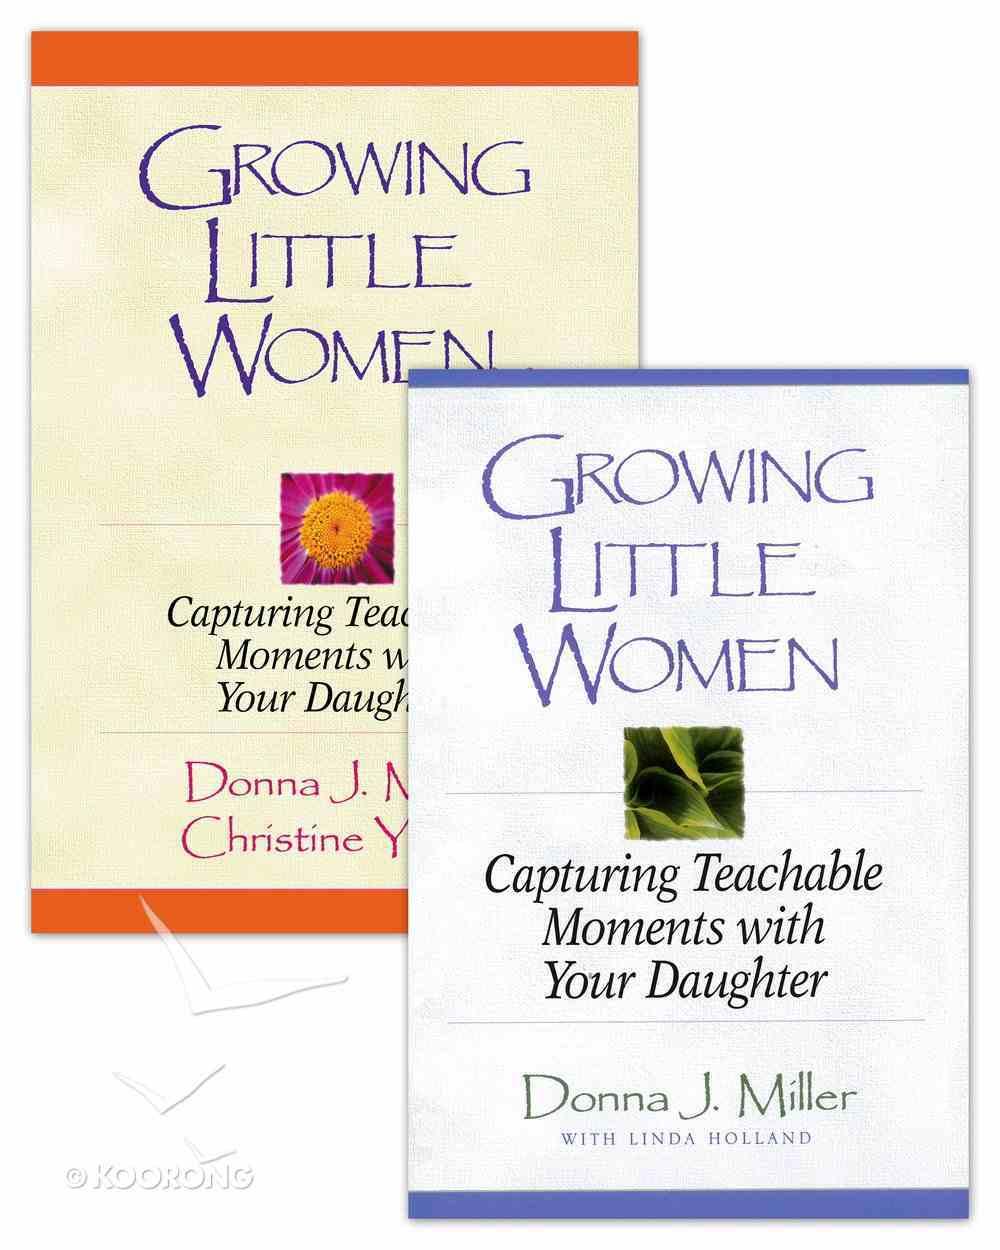 Growing Little Women/Growing Little Women For Younger Girls (Set) eBook